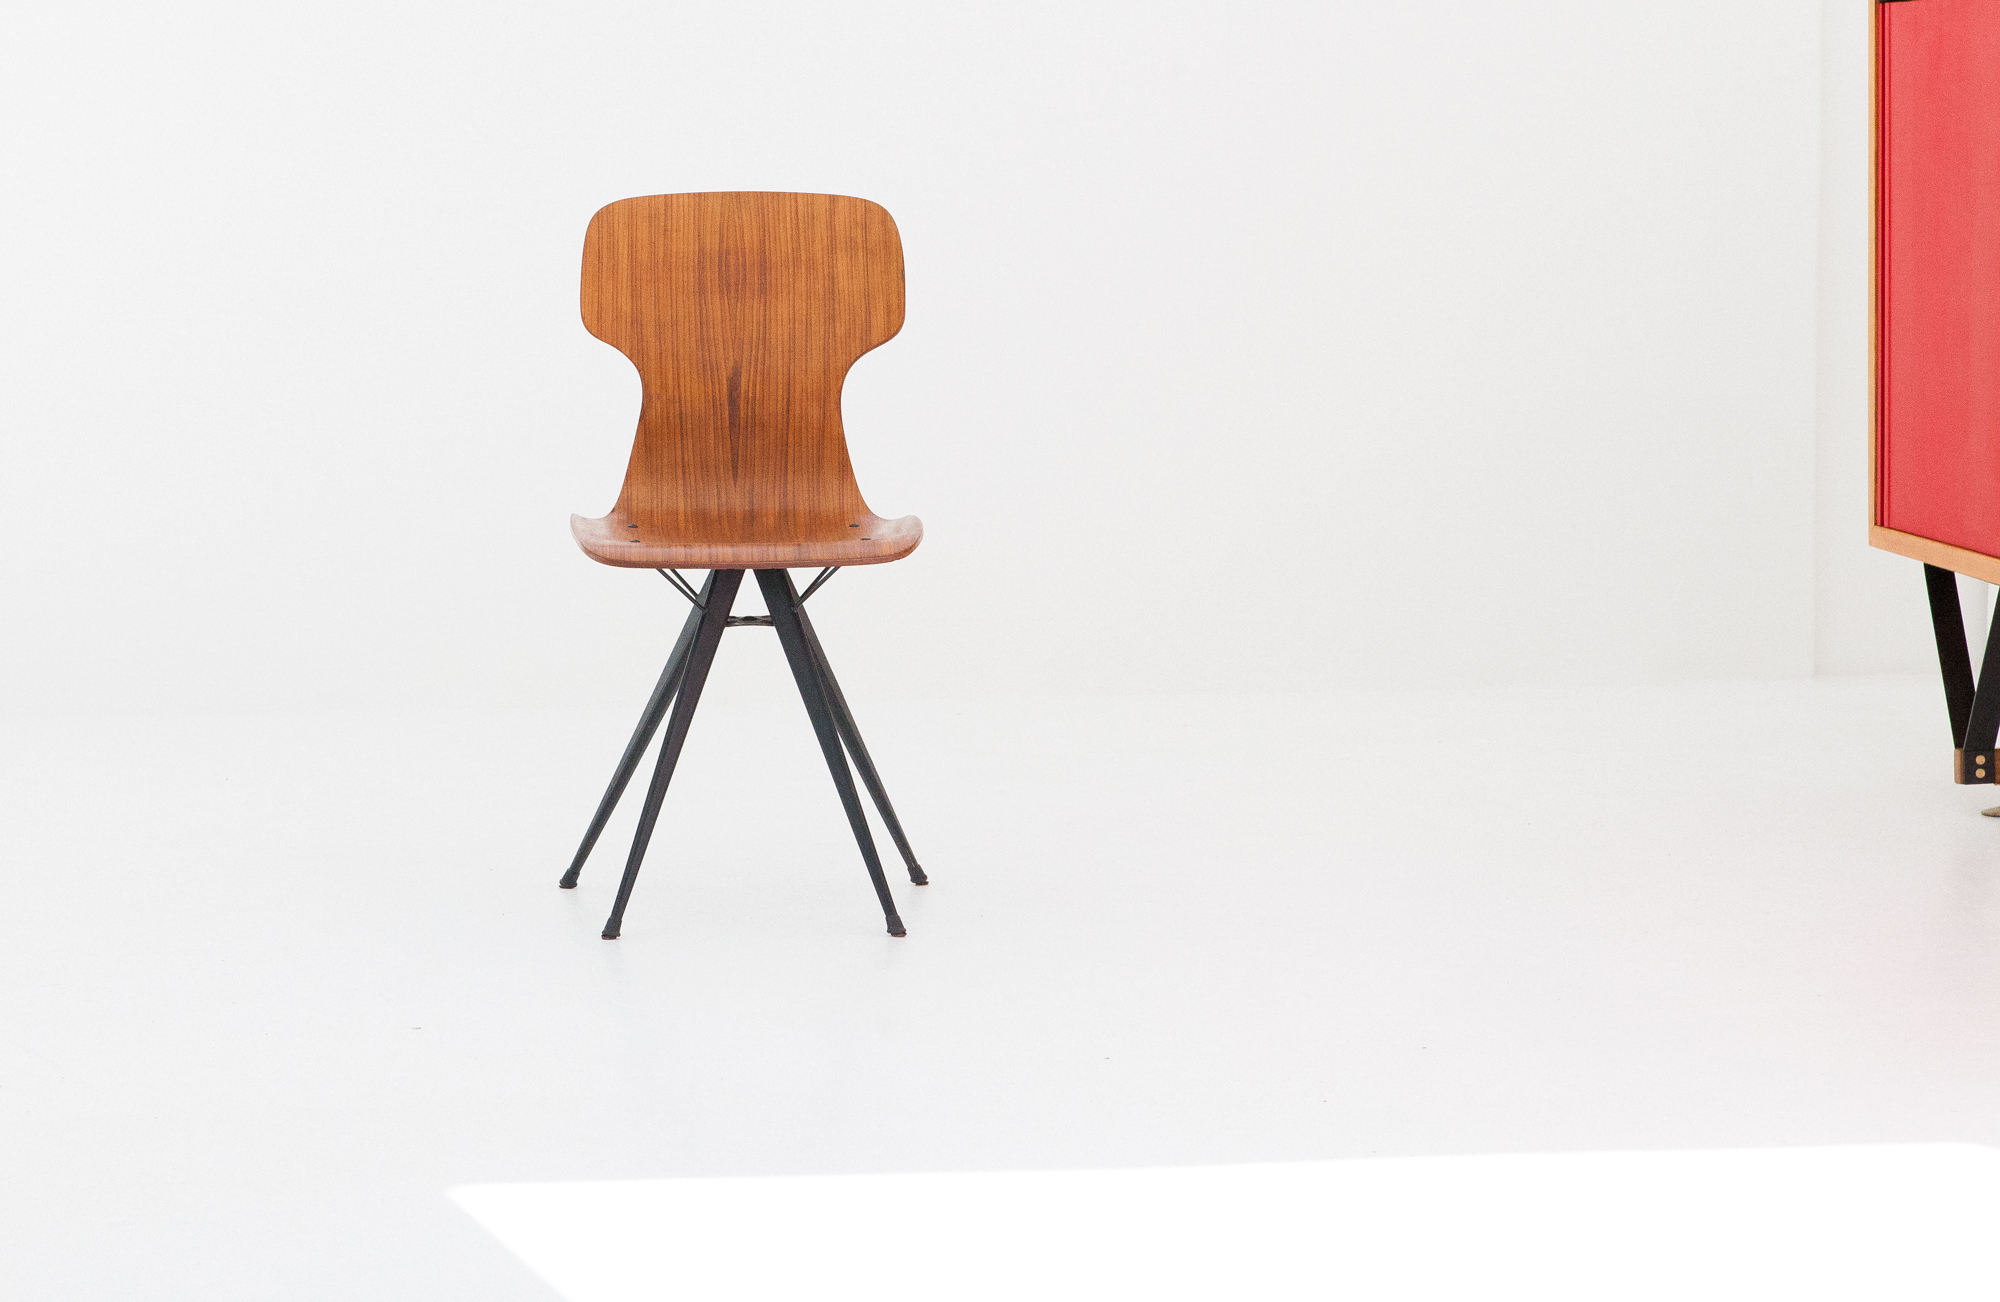 italian-curved-teak-conical-iron-legs-chair-SE280